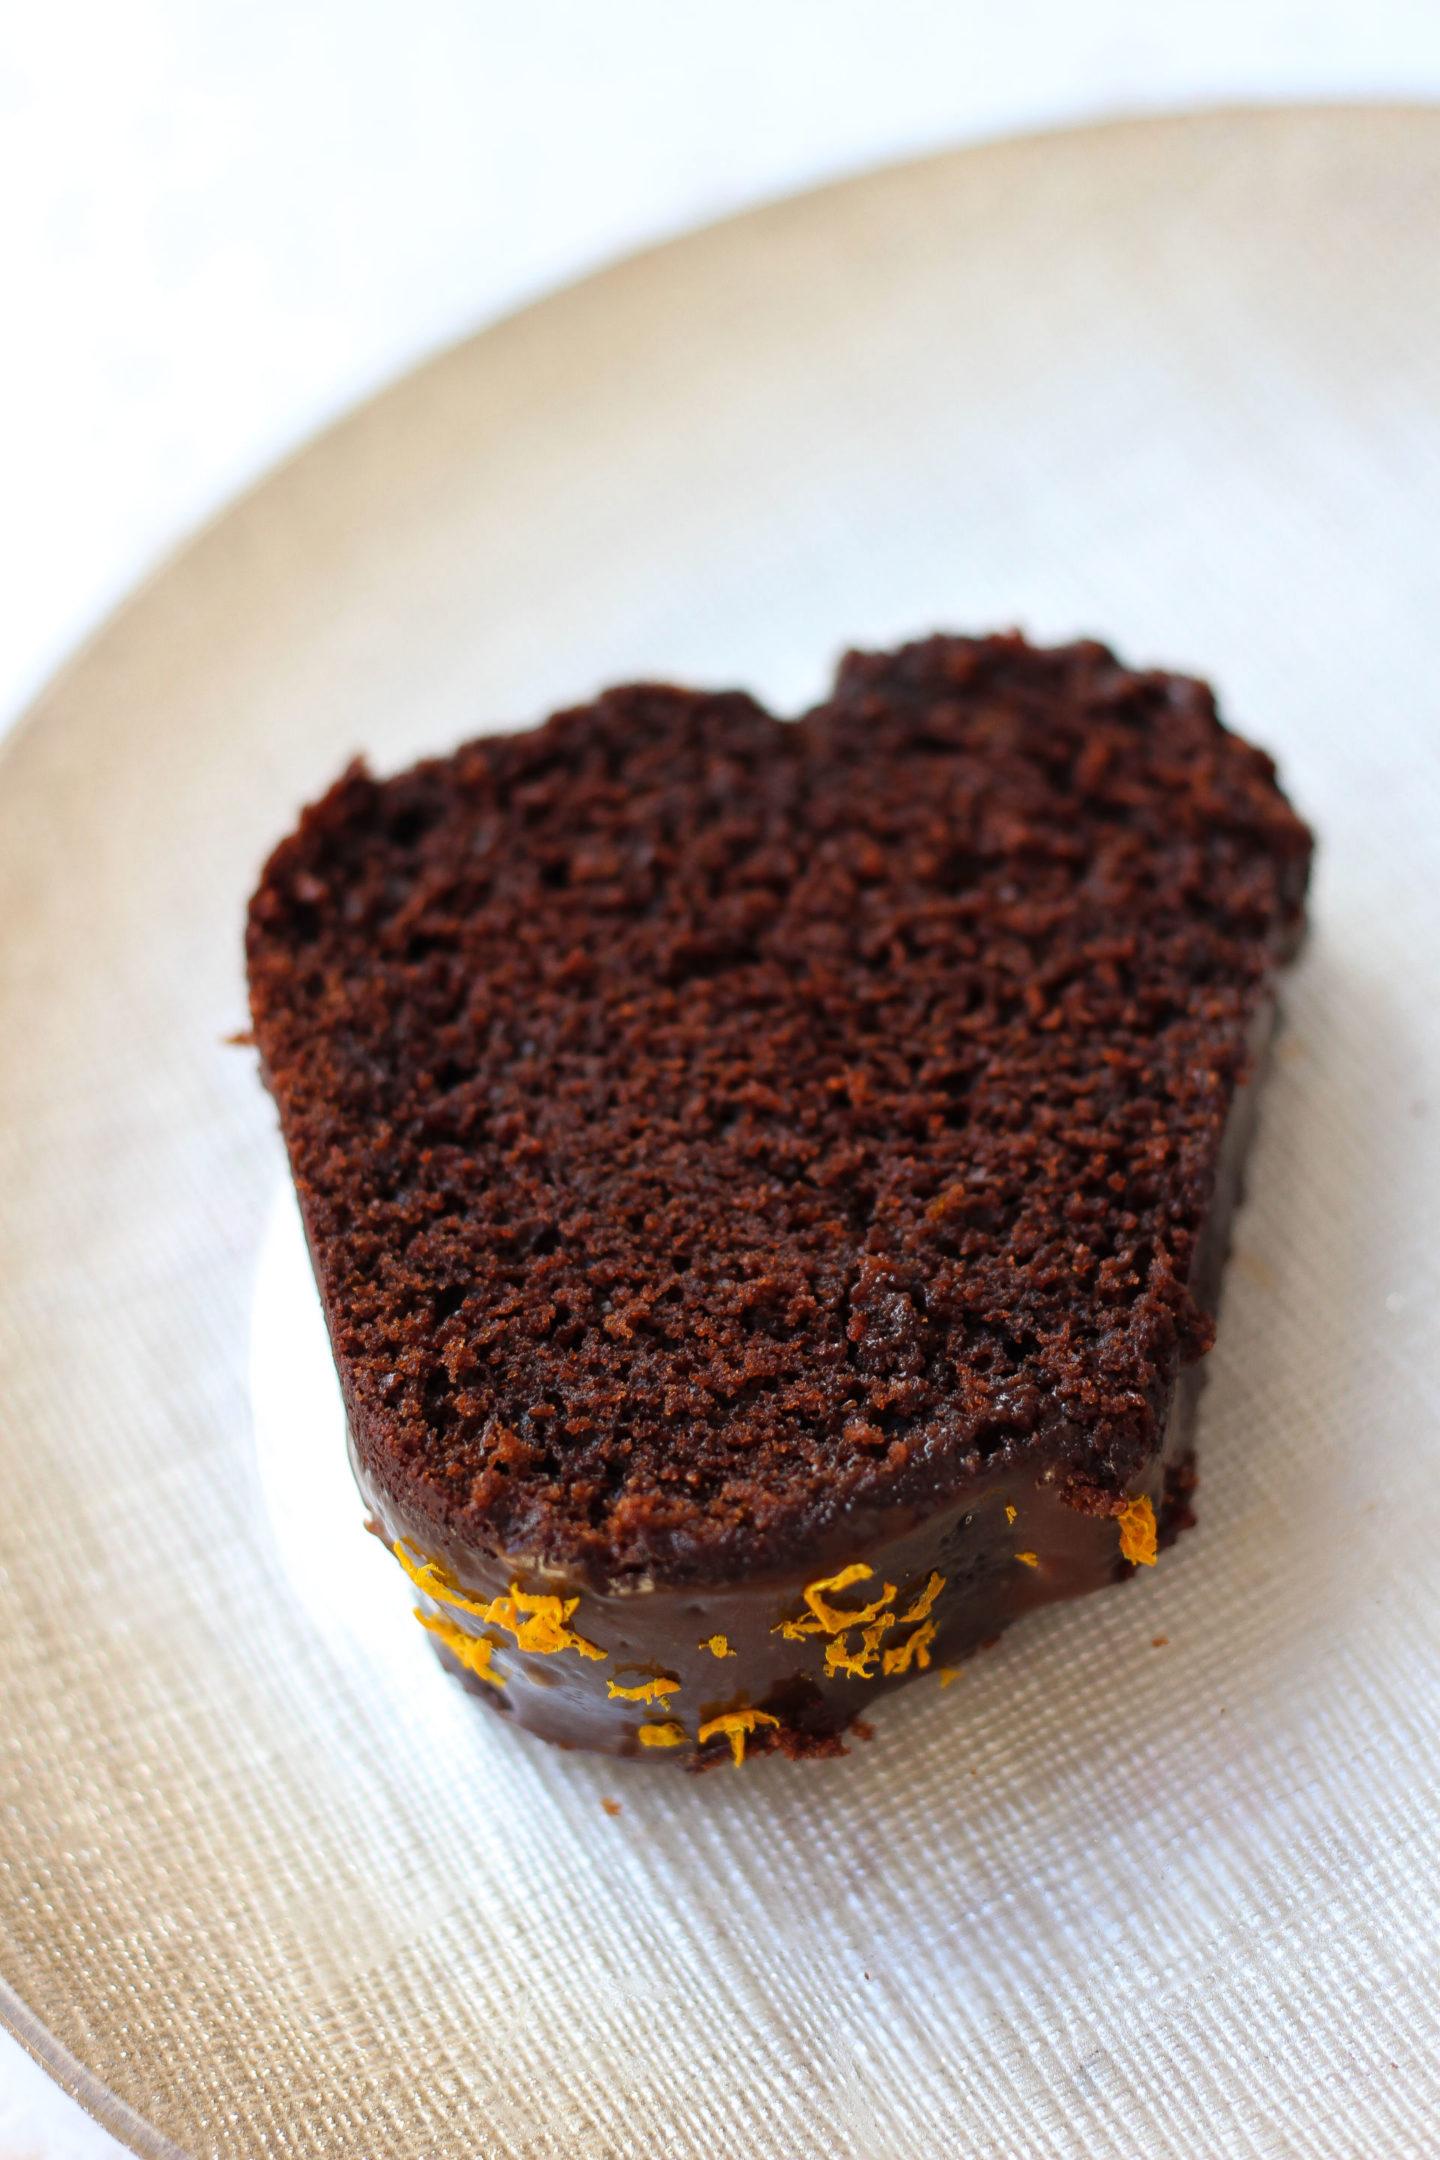 Close up of slice of chocolate orange Bundt cake on a plate